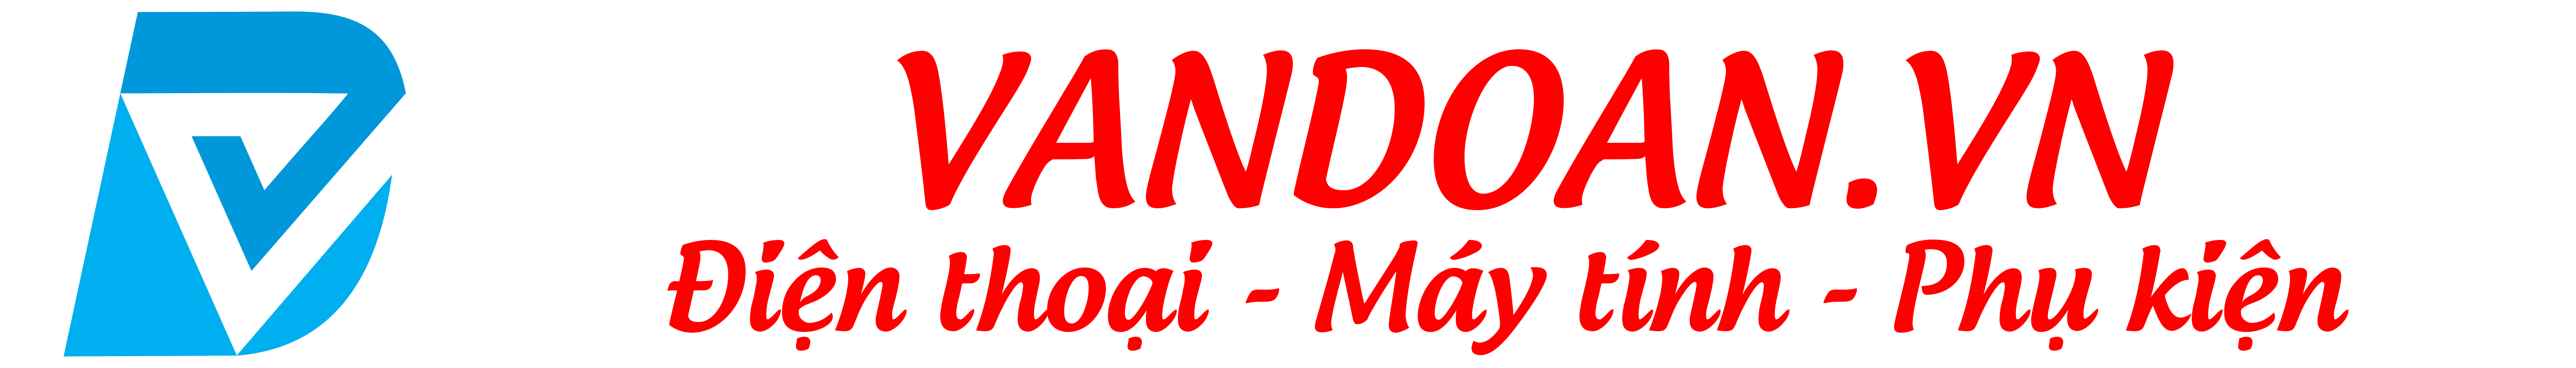 VANDOAN.VN